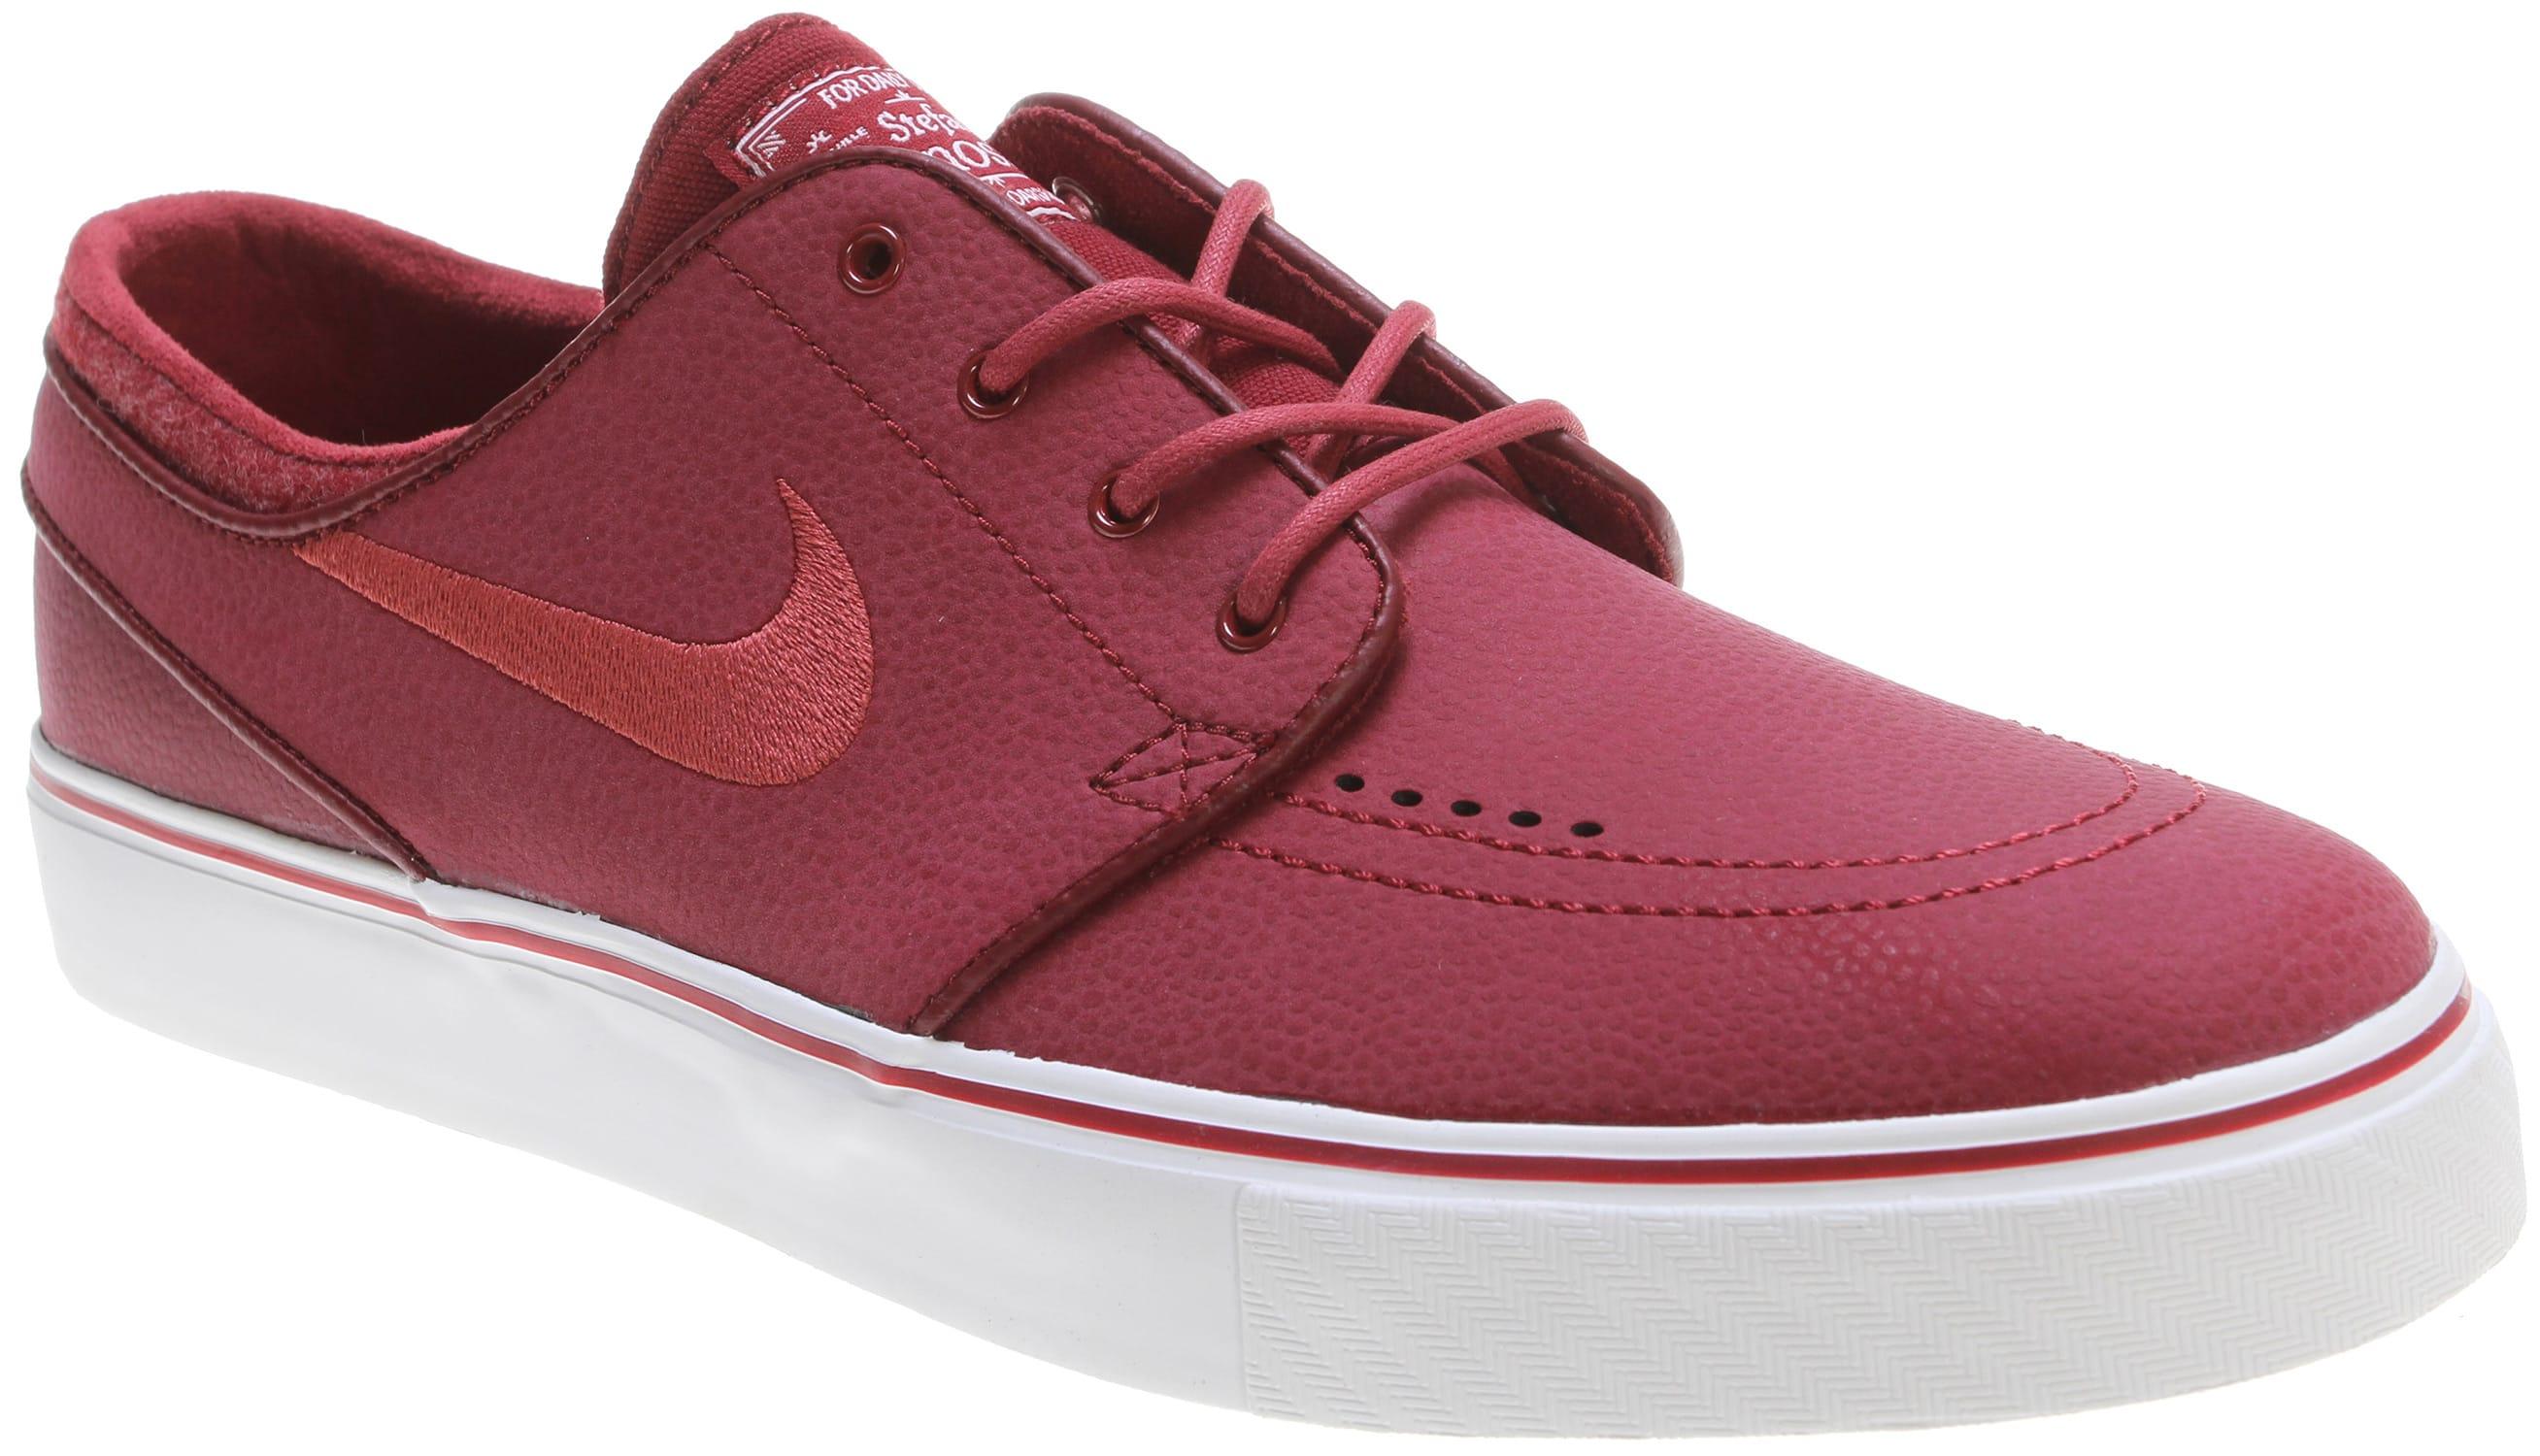 06db05e3afa Nike Zoom Stefan Janoski L Skate Shoes - thumbnail 2